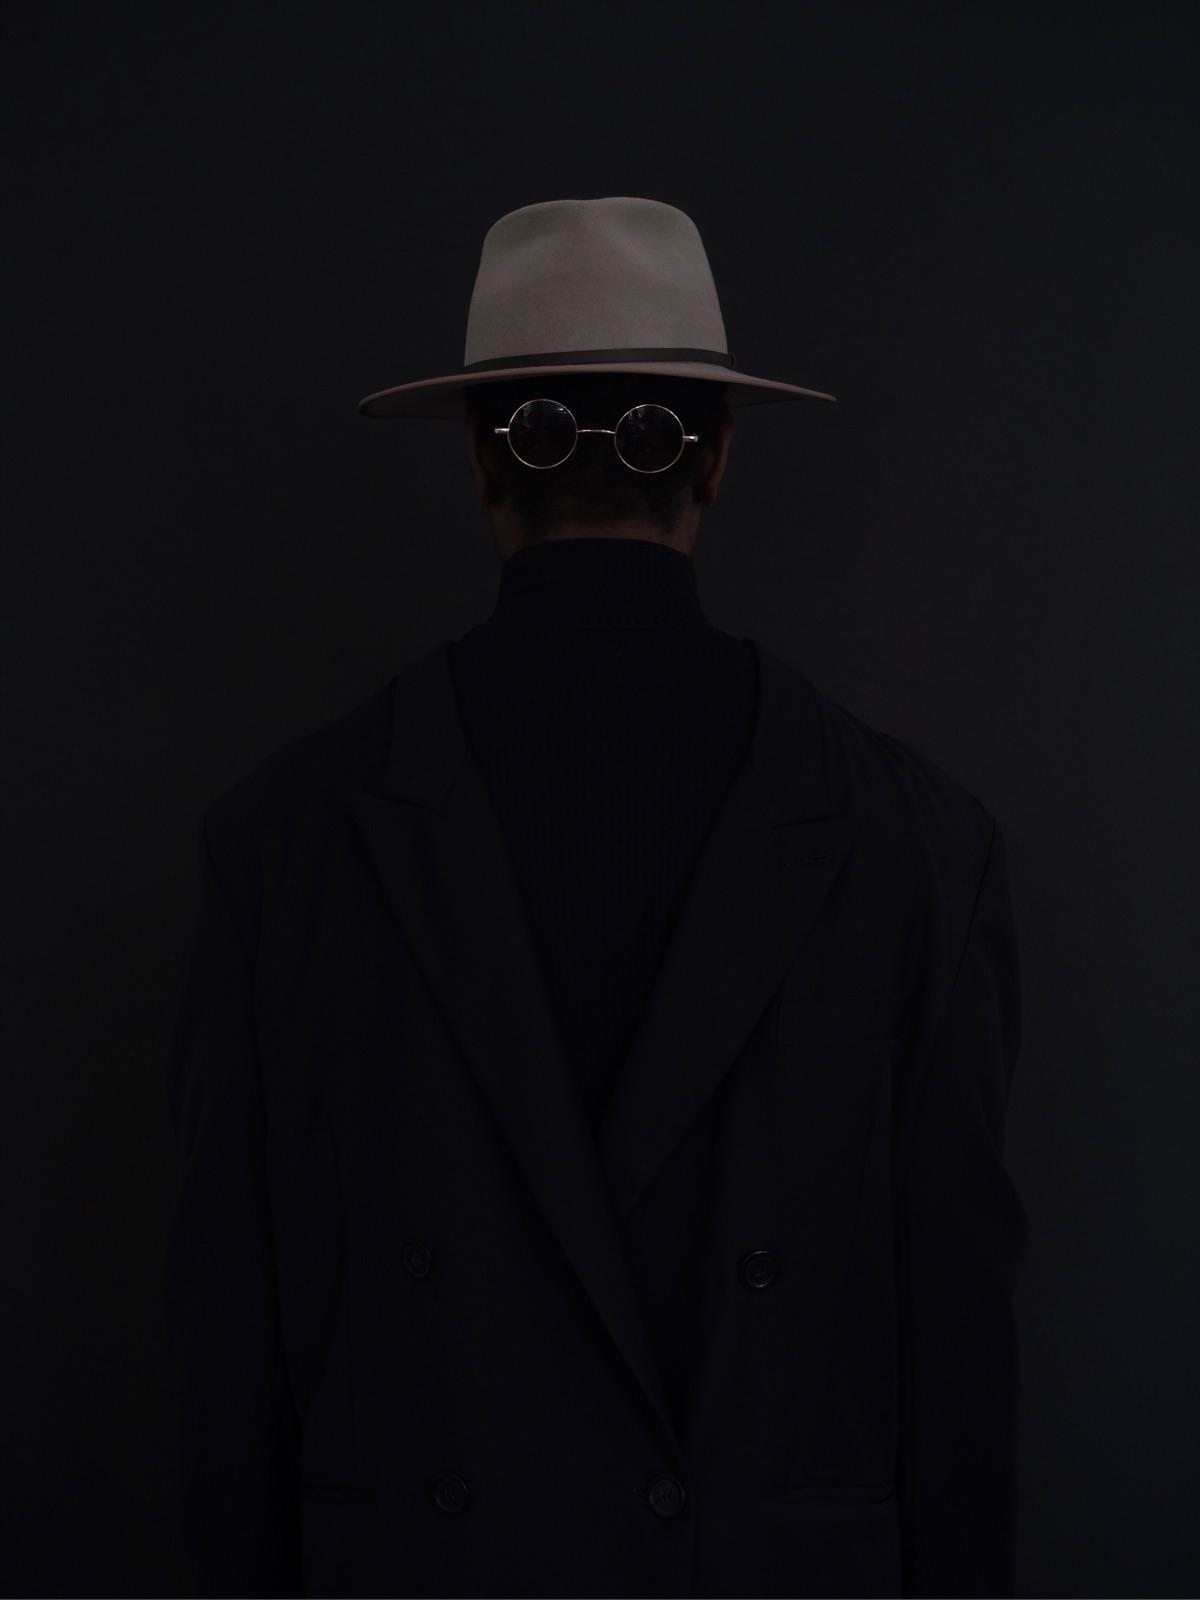 ello, portrait, surreal, melanin - chvrlesjr | ello